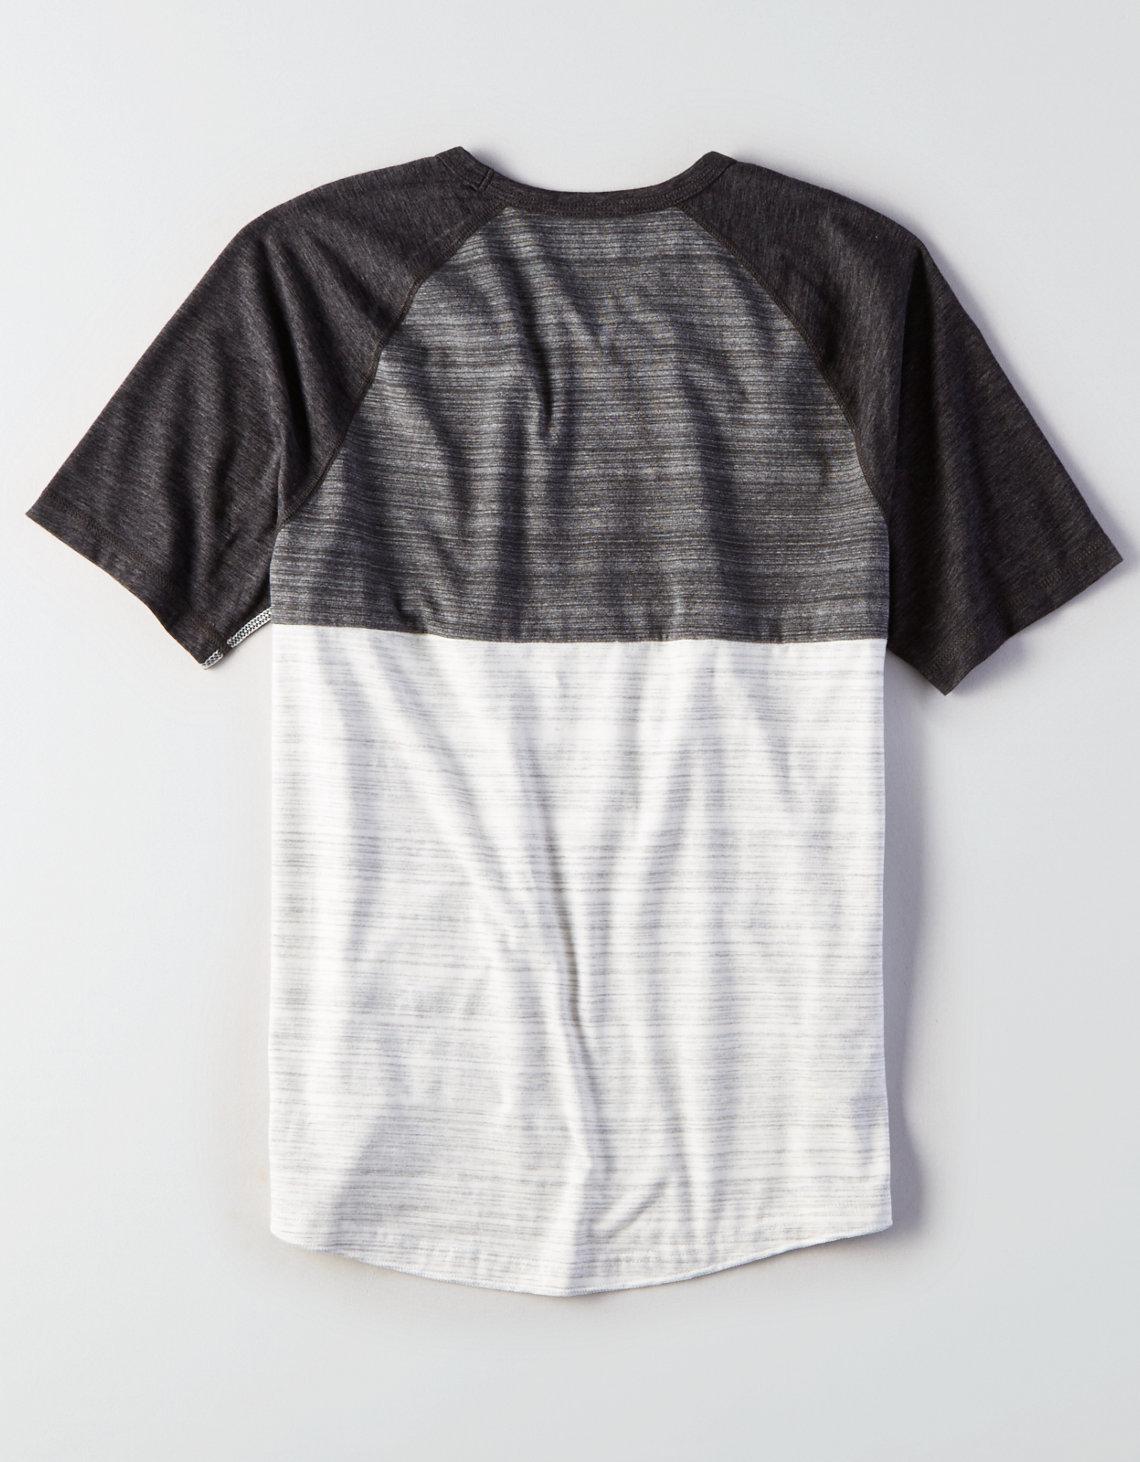 342cefdffc9b American Eagle Flex Colorblock T-shirt in Gray for Men - Lyst